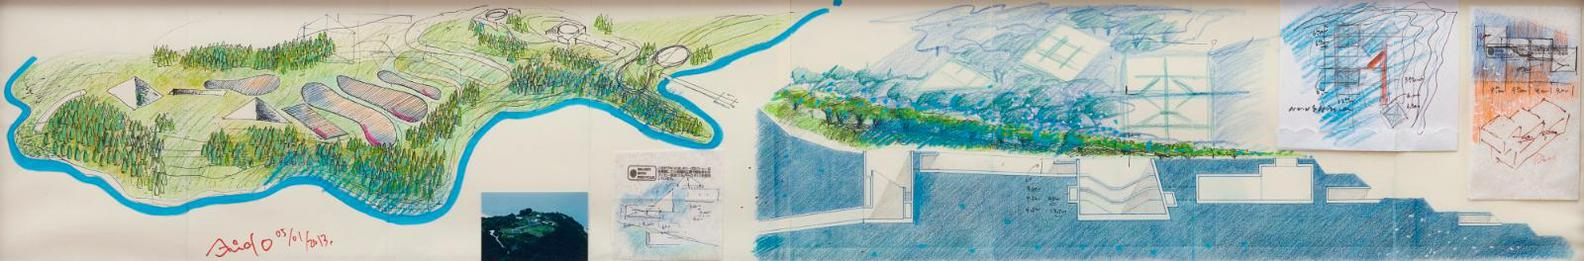 Tadao Ando-Untitled-2013